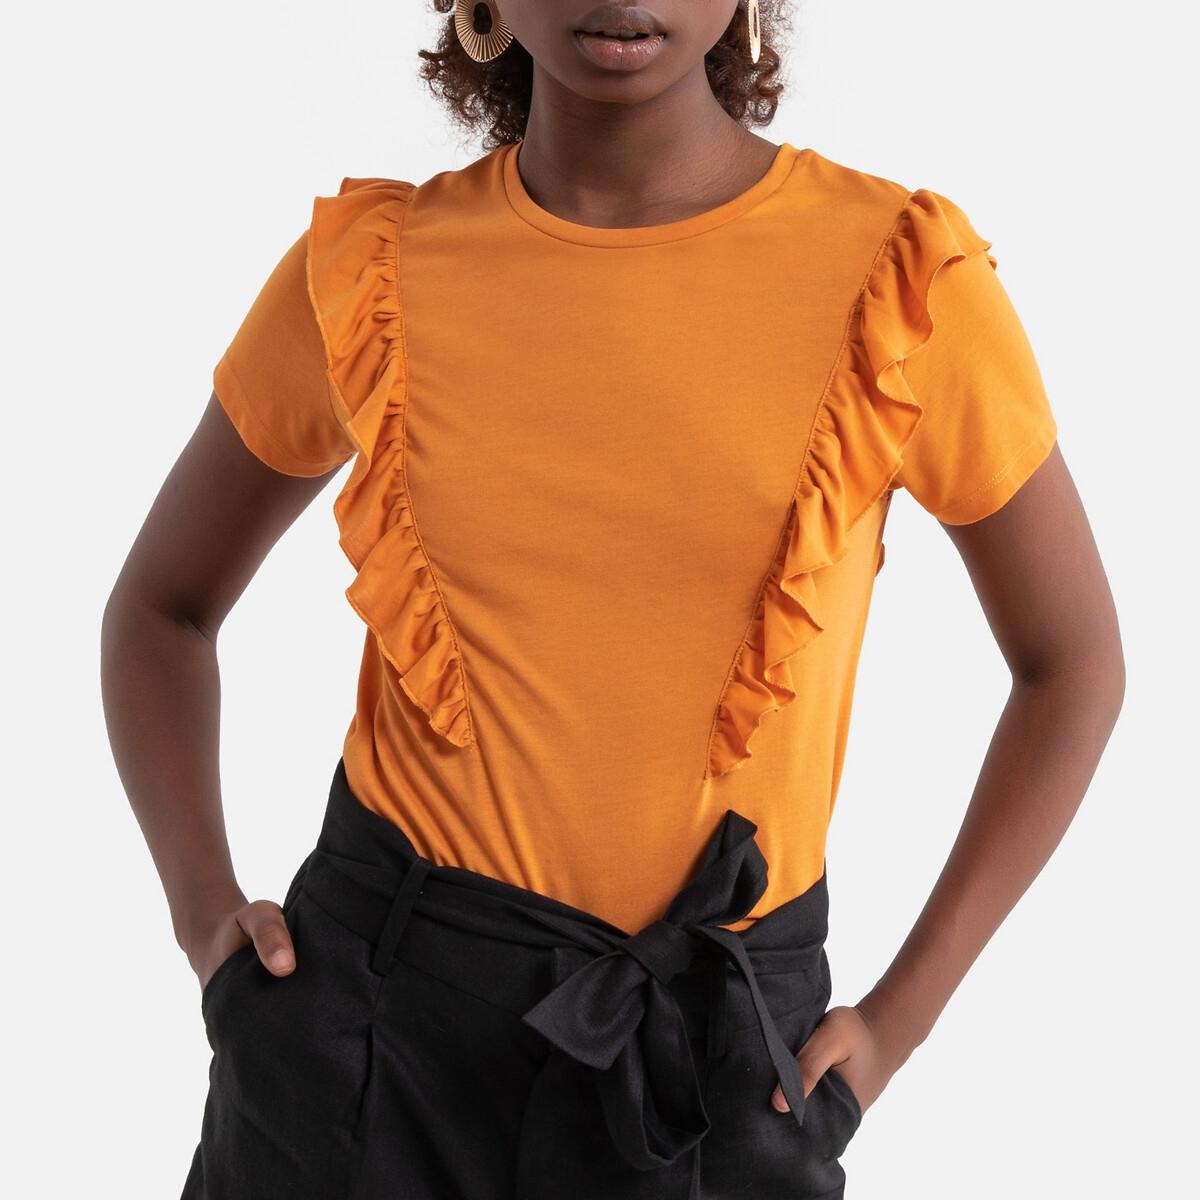 Футболка LaRedoute С короткими рукавами и воланами M оранжевый футболка laredoute из биохлопка с короткими рукавами vegiflower m зеленый